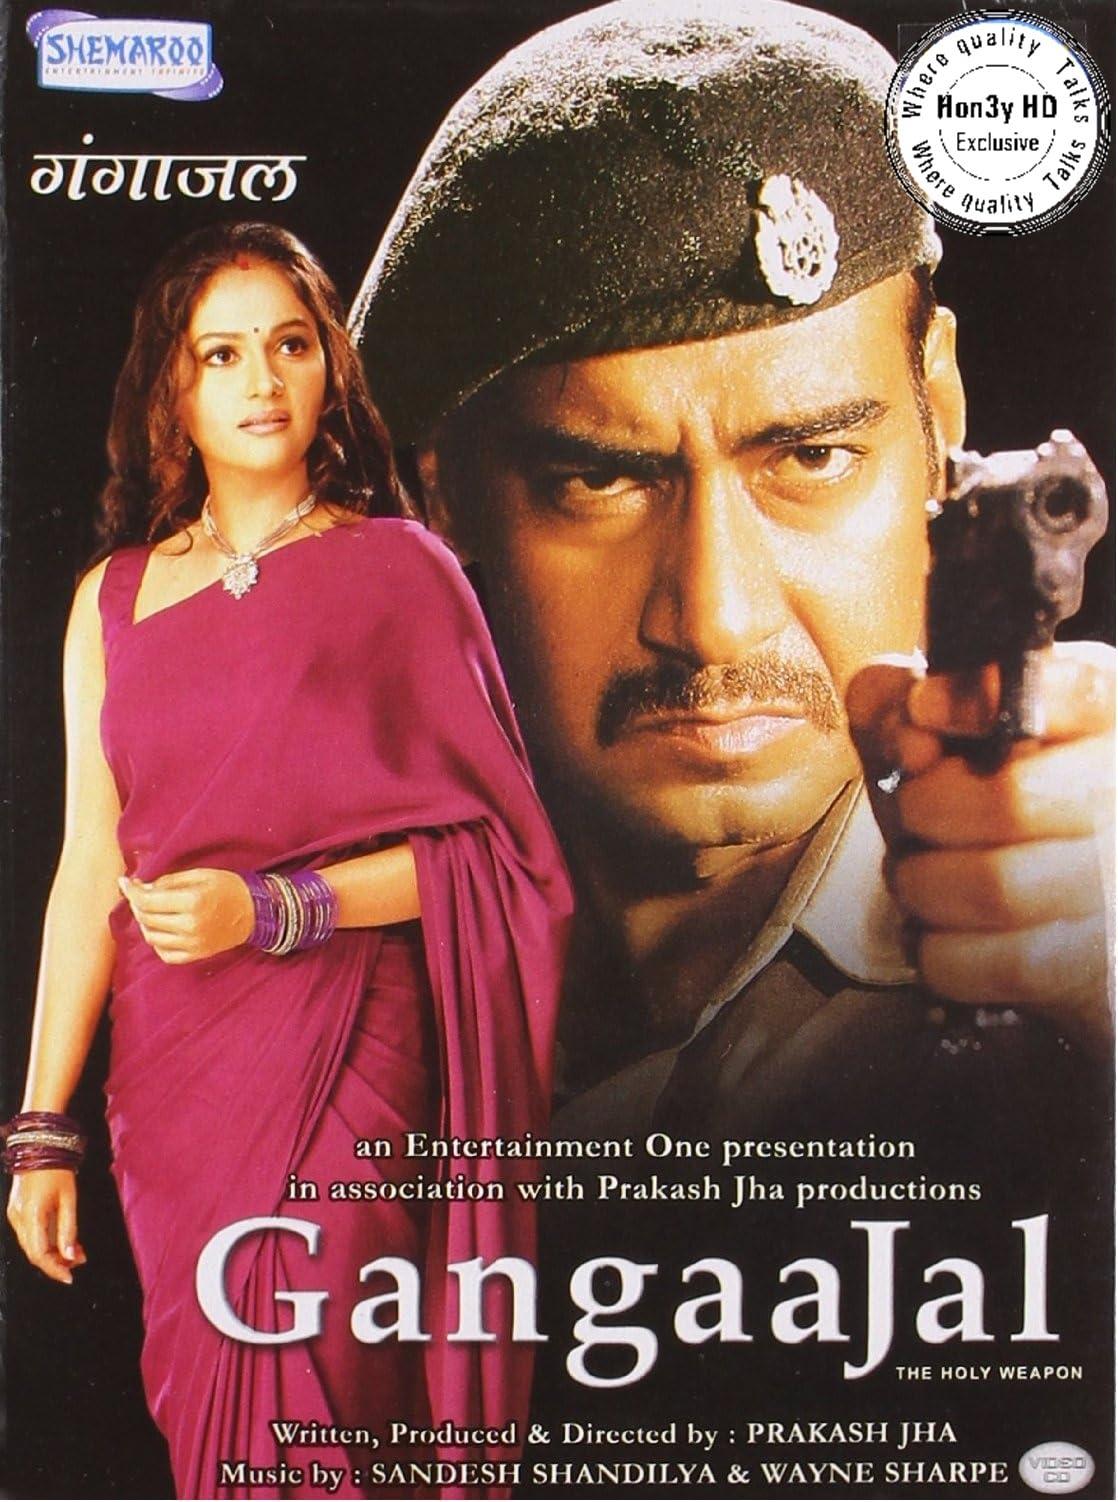 Gangaajal (2003)